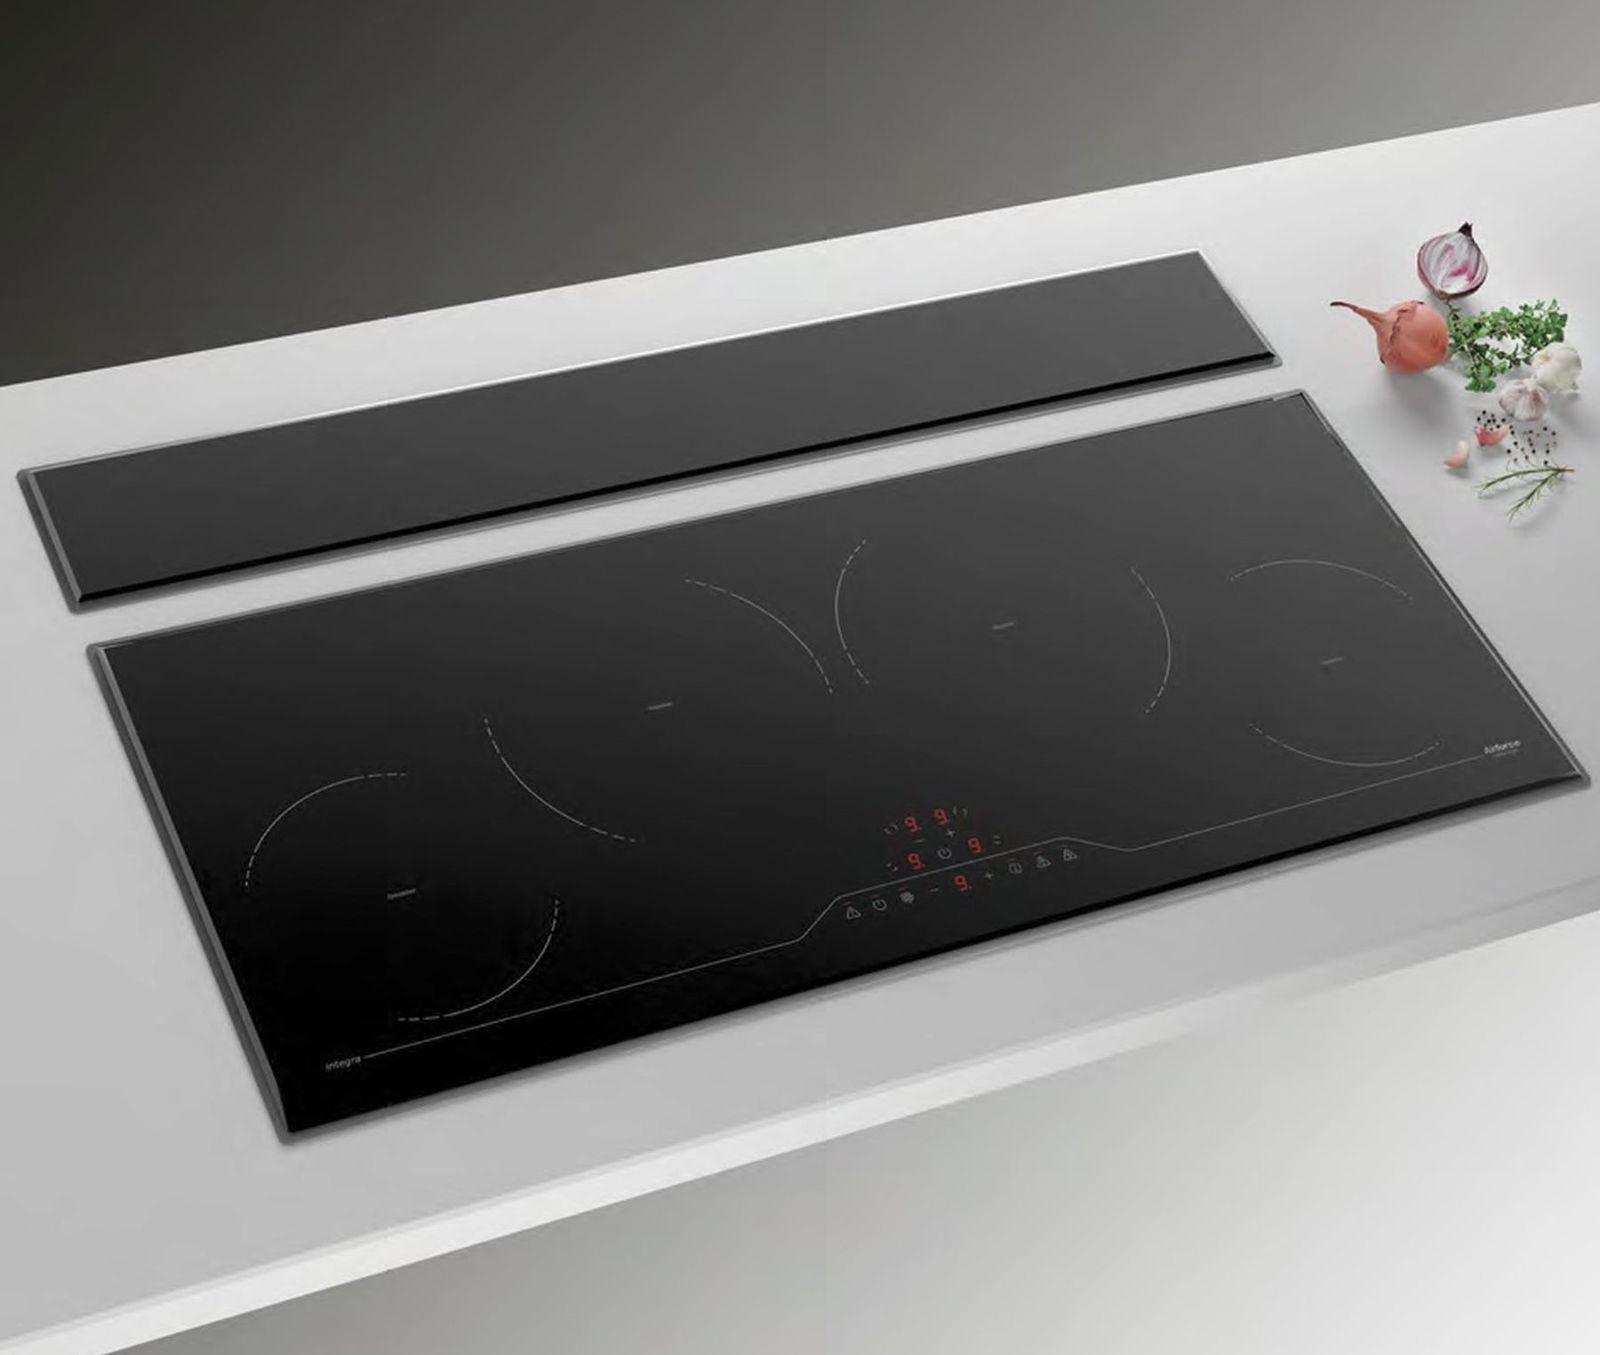 4 x glas induktions kochfeld timer edelstahl abzugshaube versenkbar 551255 kaufen bei. Black Bedroom Furniture Sets. Home Design Ideas